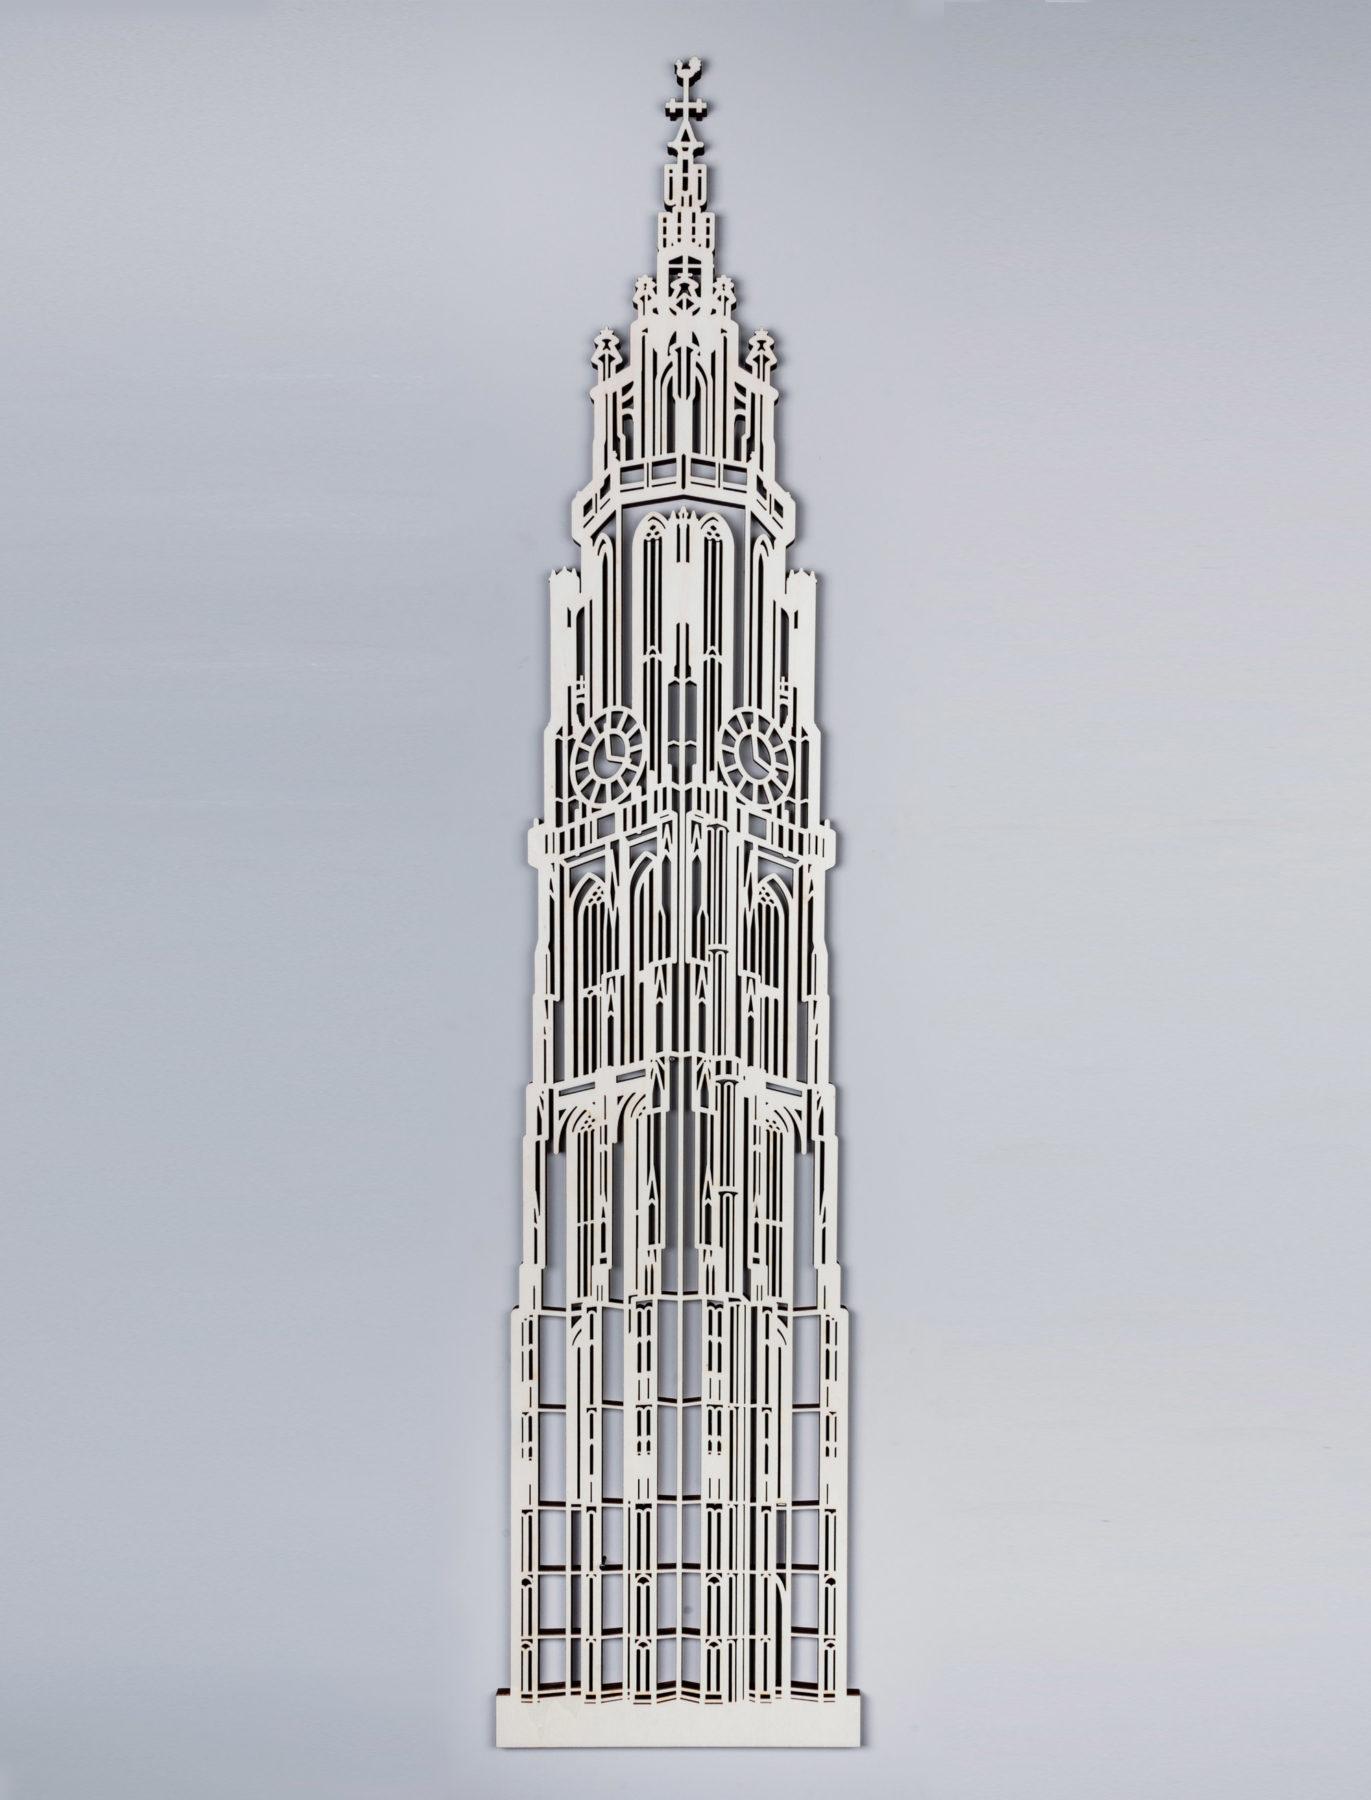 Kathedraal Antwerpen hout